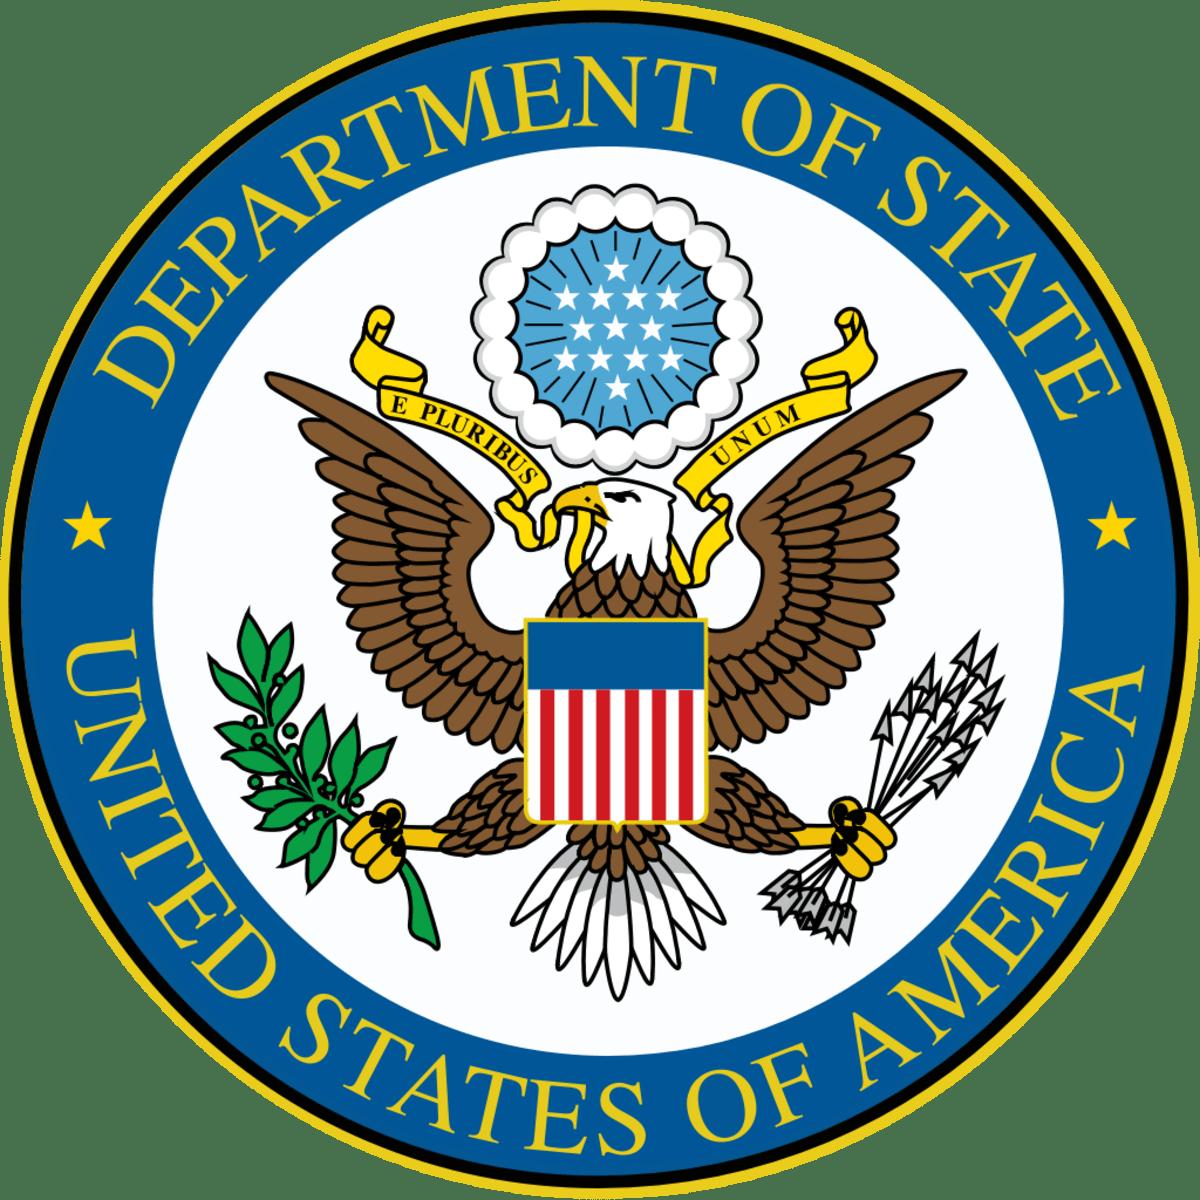 National Symbols Of United States Of America